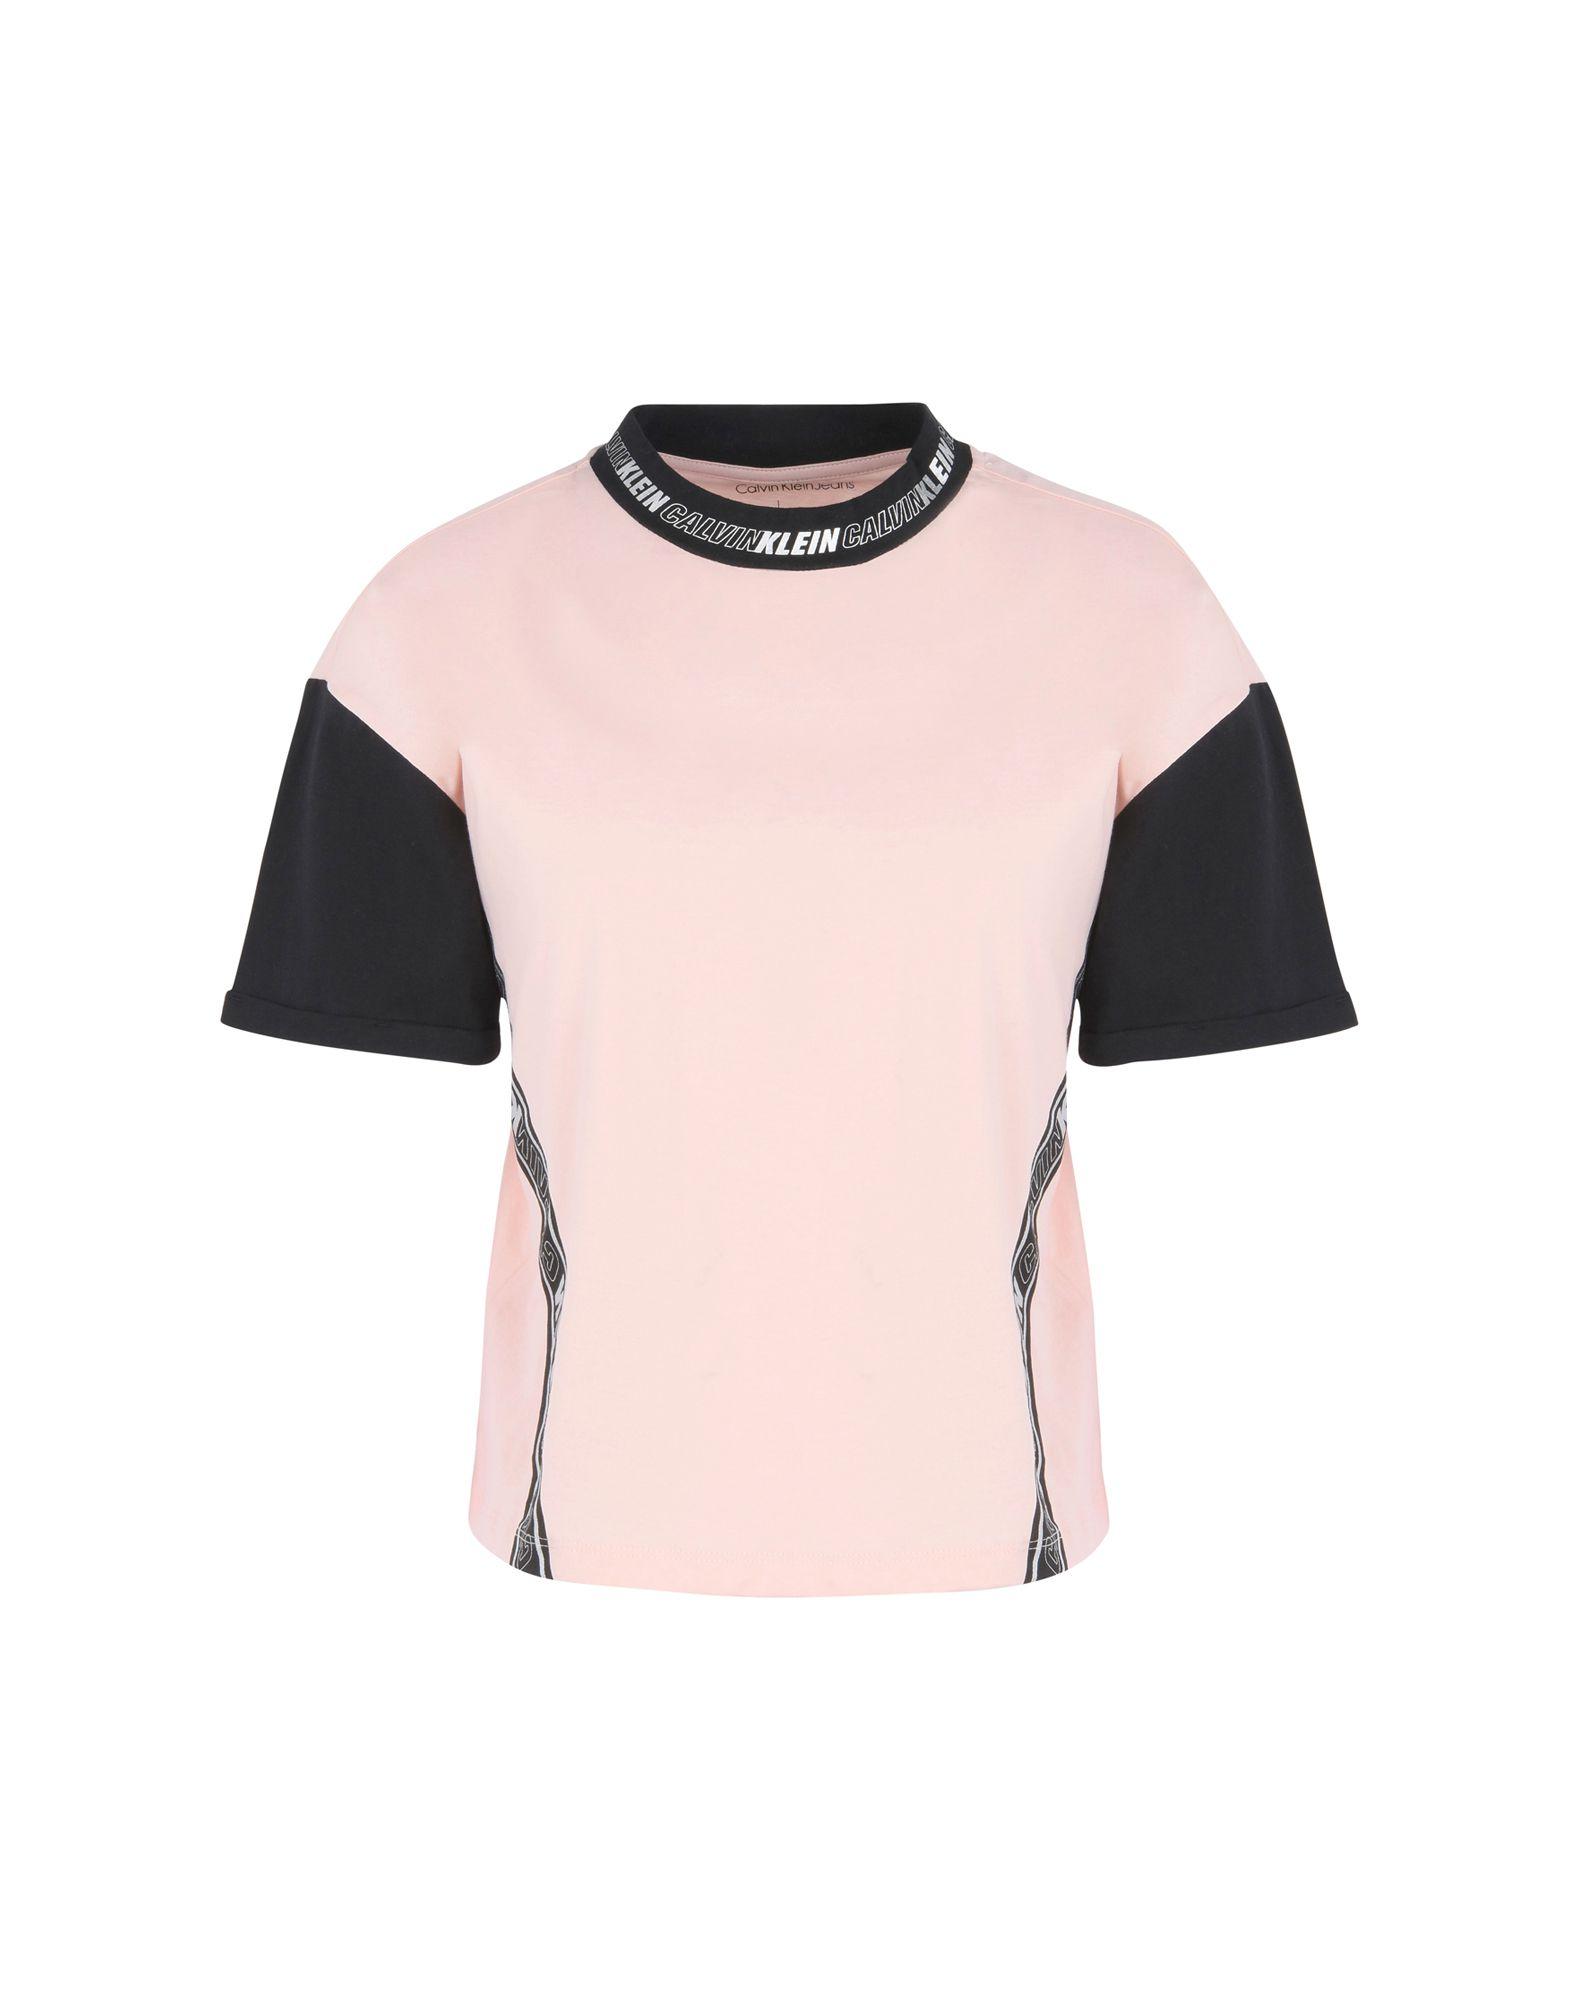 CALVIN KLEIN JEANS Футболка футболка calvin klein jeans calvin klein jeans ca939ewzjs45